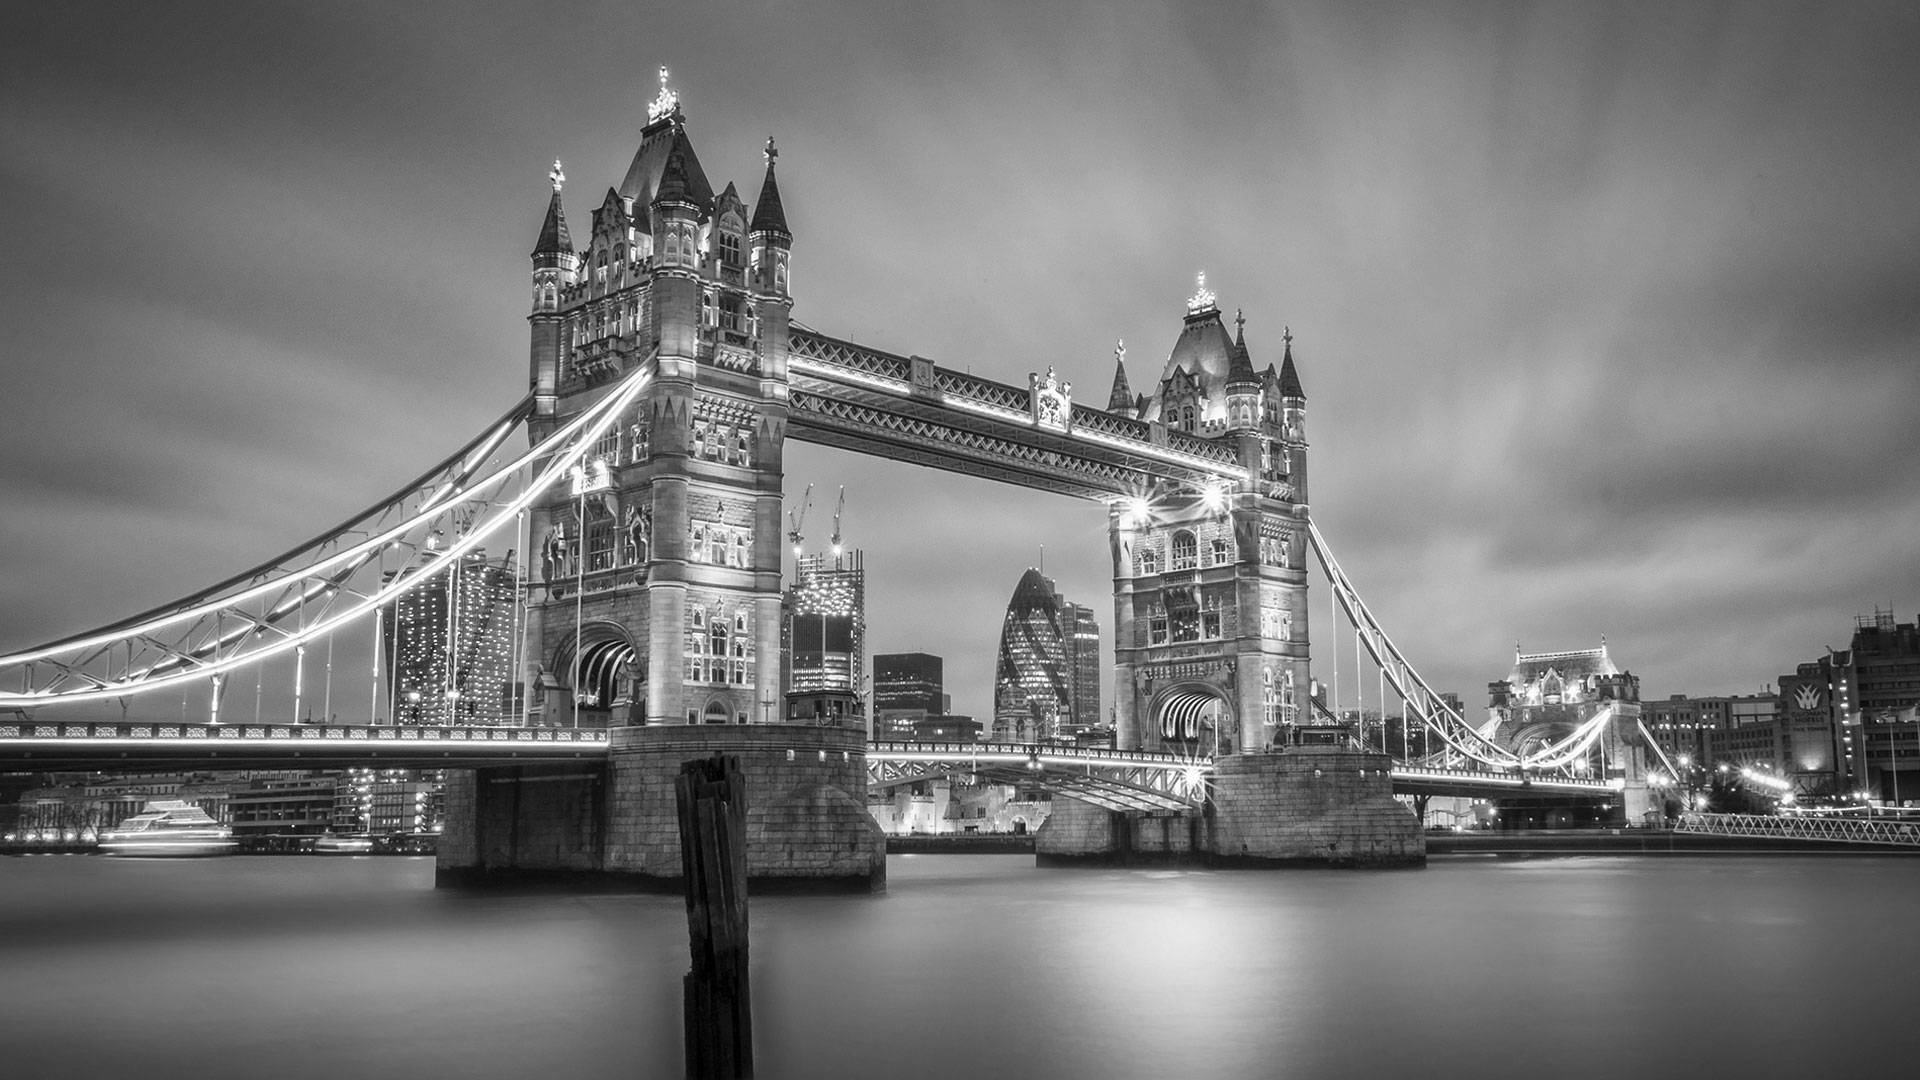 London Black And White Wallpapers Desktop - Obaasima com